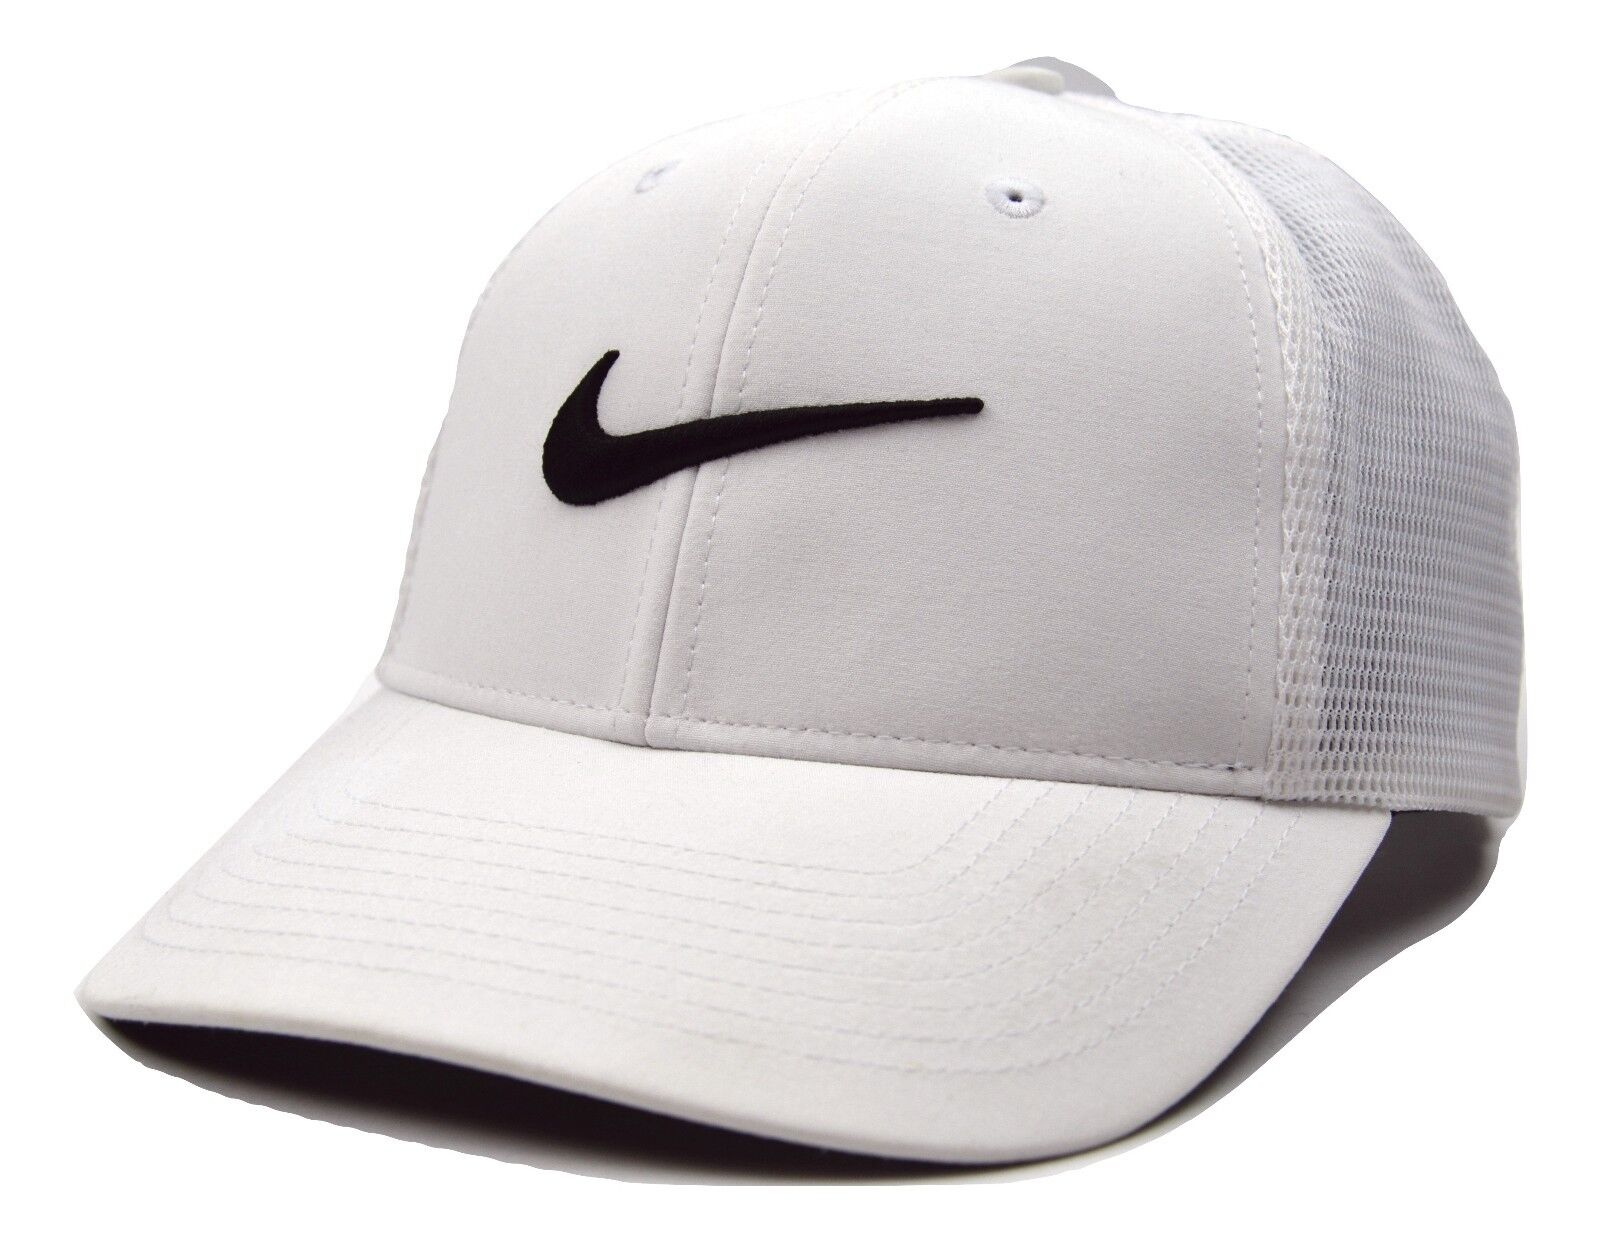 529d066b Nike Golf Legacy 91 Tour Mesh Adult Mens Stretch L/xl Hat White ...